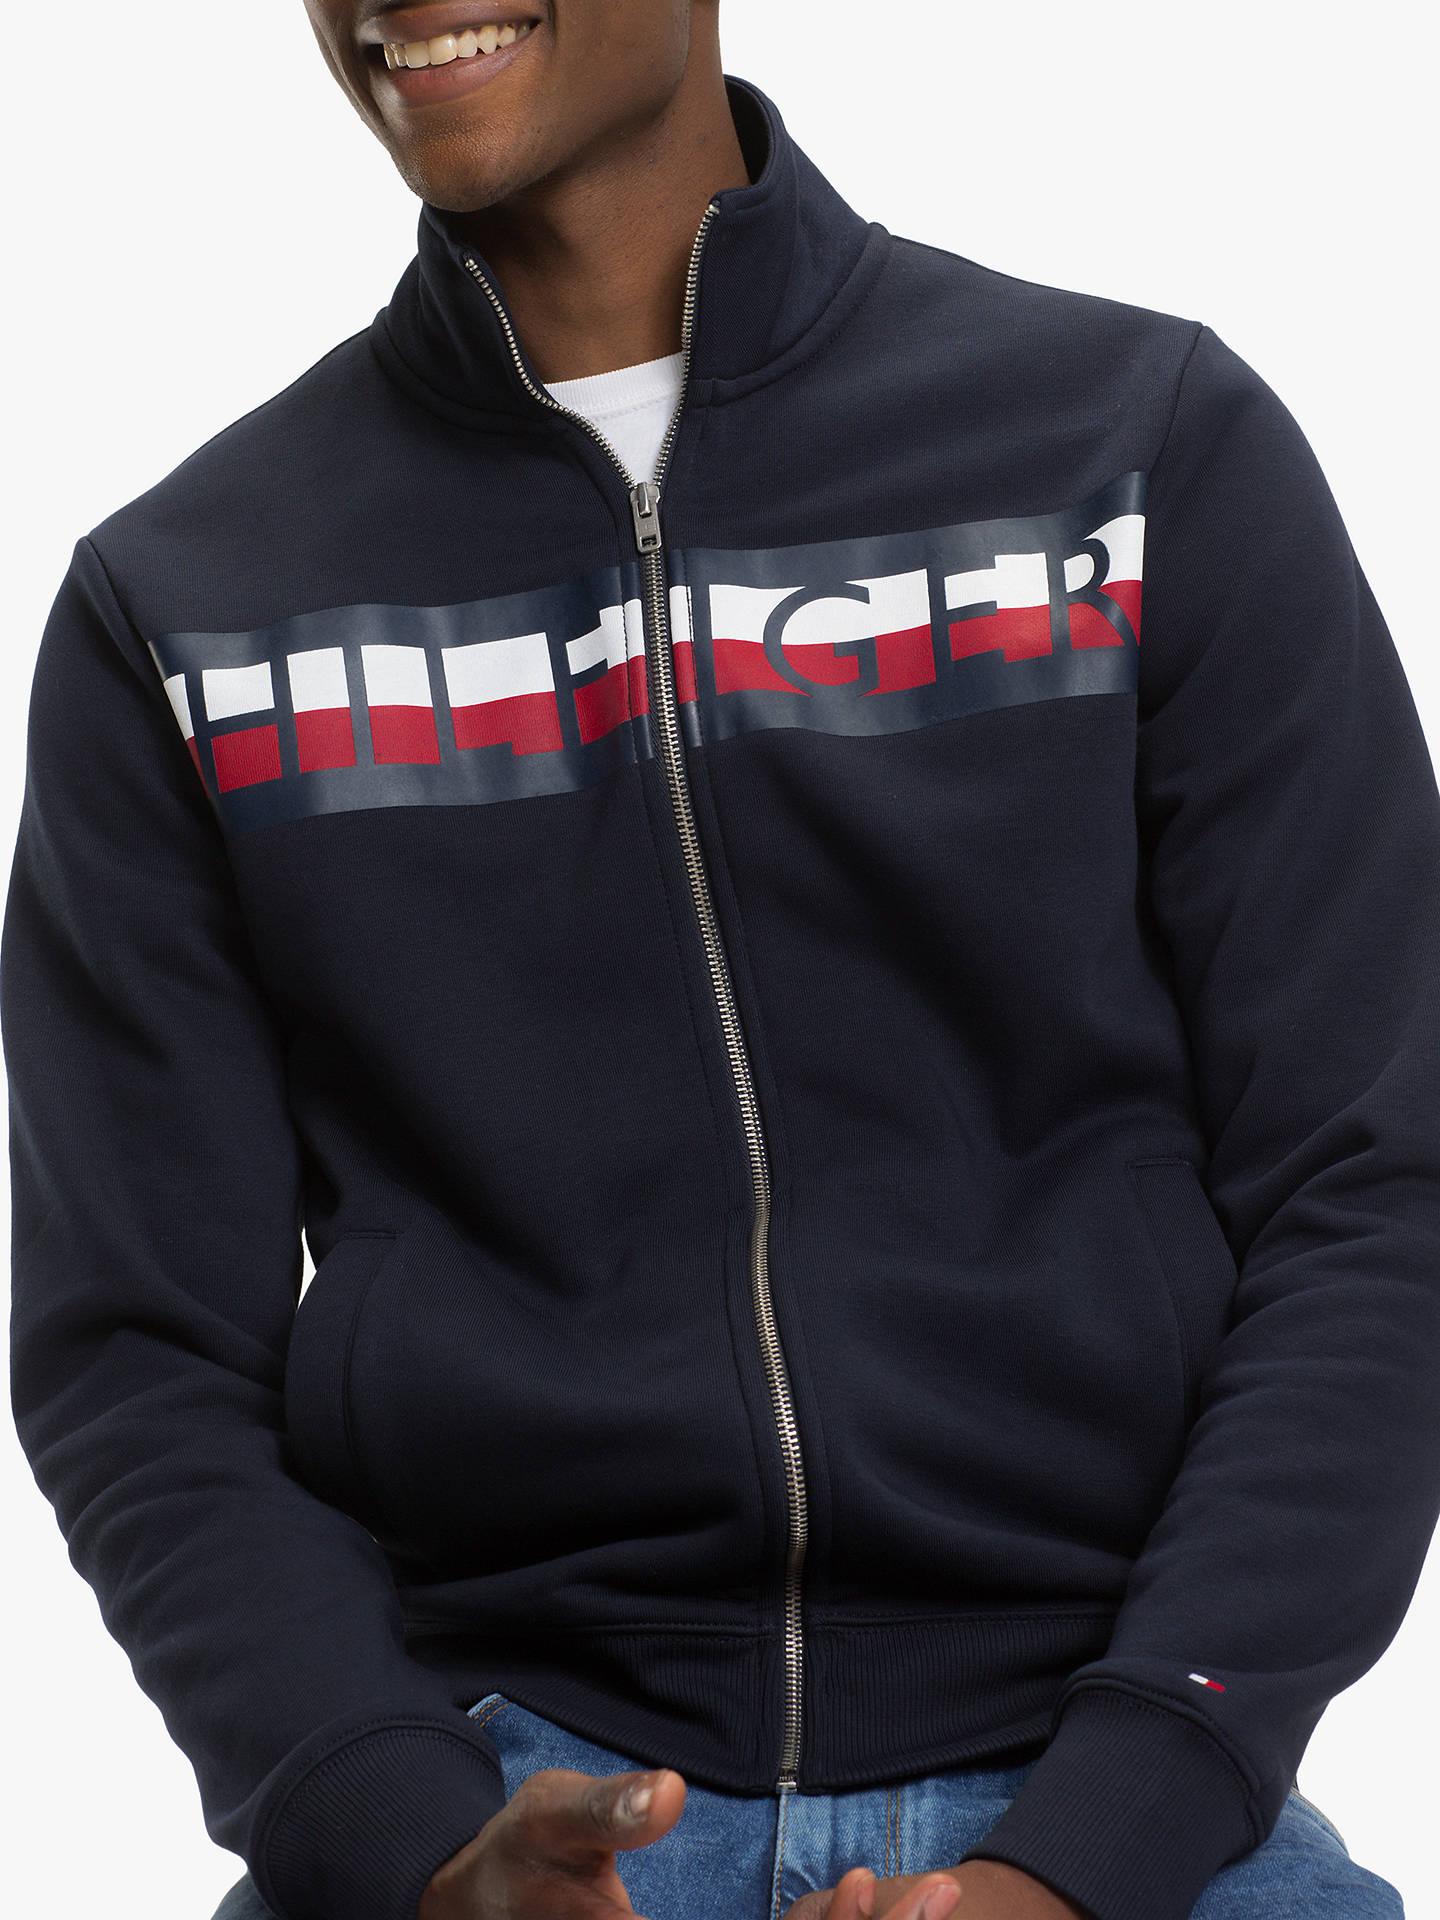 c723c4d5 ... Buy Tommy Hilfiger Zip Through Sweatshirt, Sky Captain, XL Online at  johnlewis.com